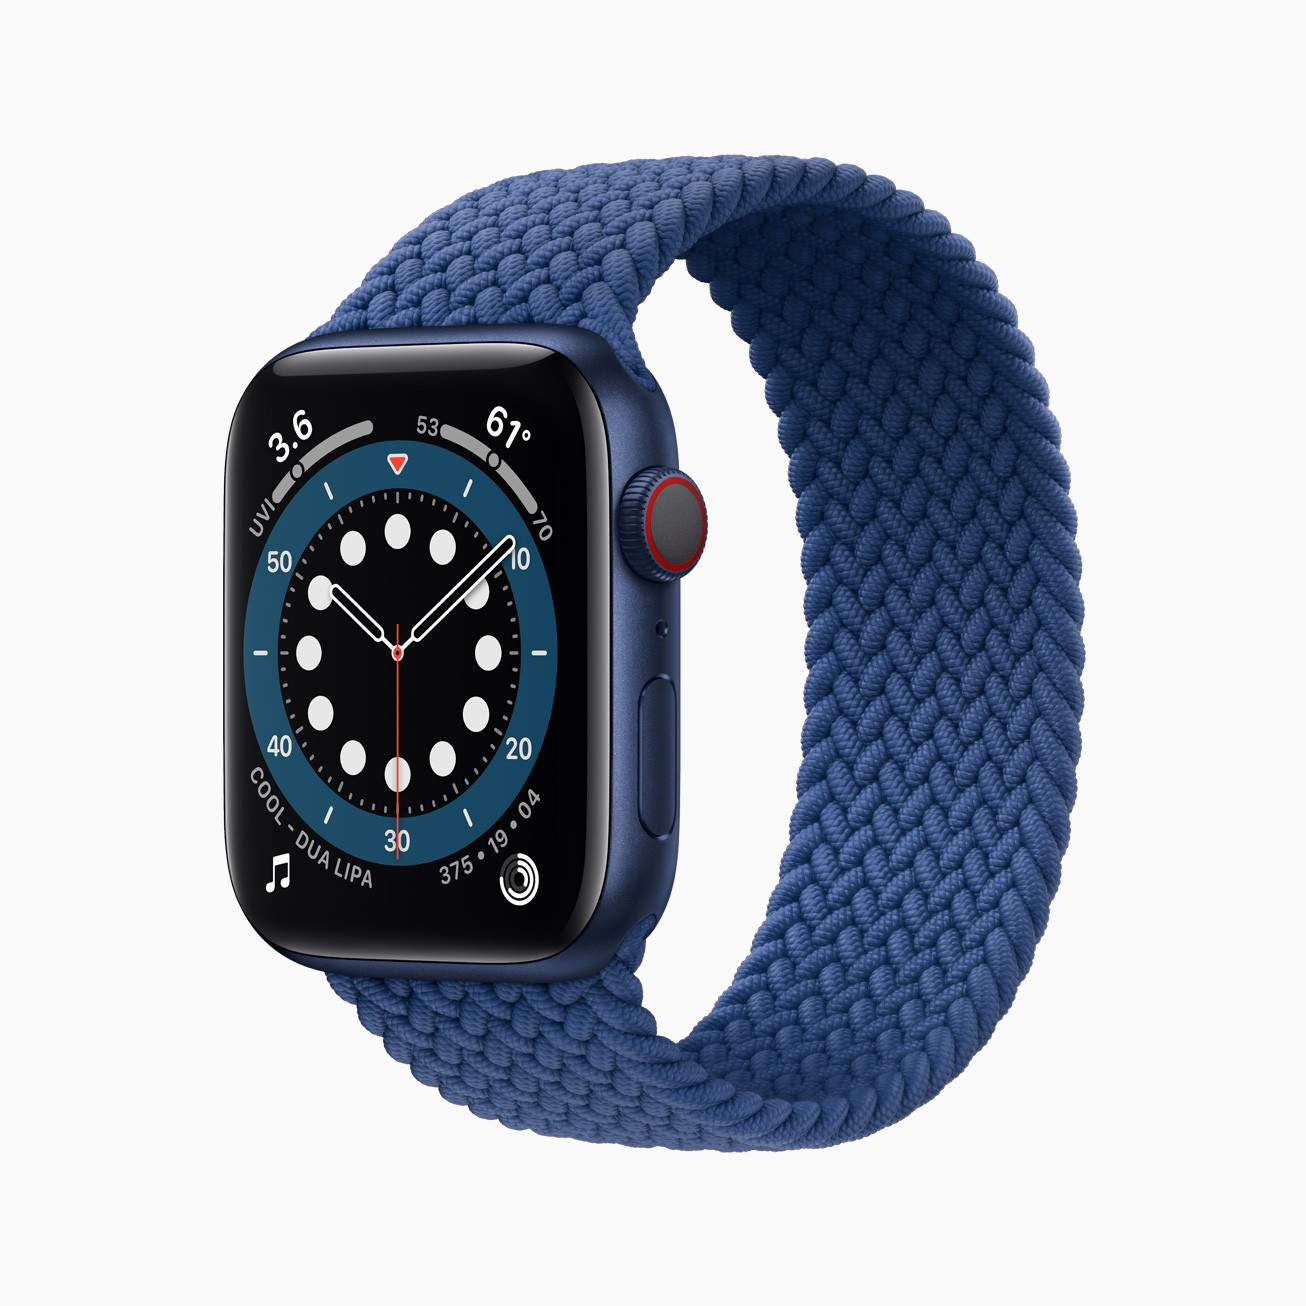 Apple watch series 6 aluminum blue case 09152020